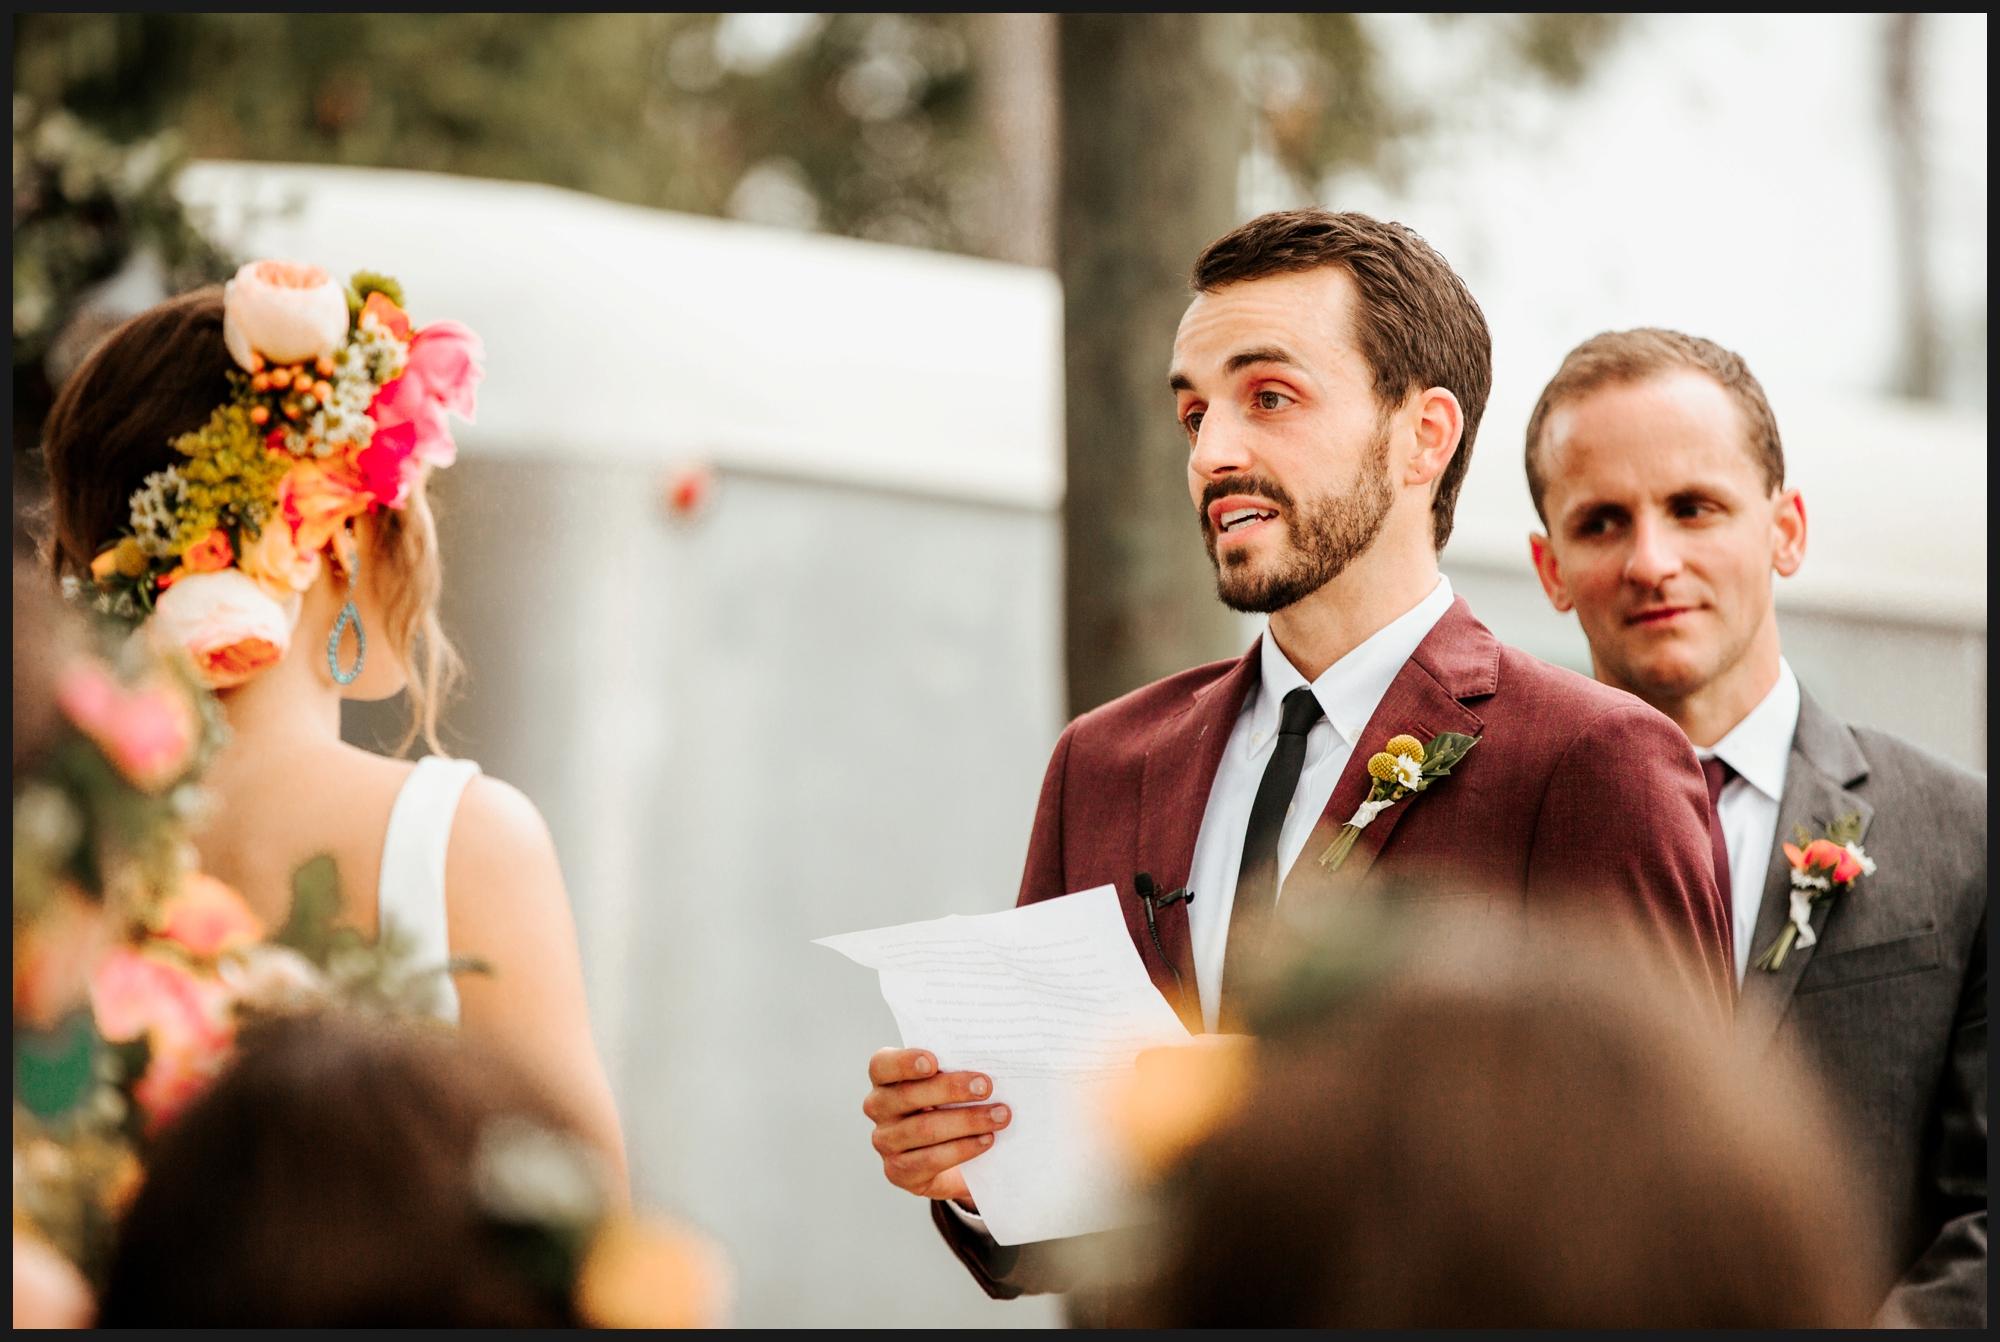 Orlando-Wedding-Photographer-destination-wedding-photographer-florida-wedding-photographer-bohemian-wedding-photographer_2007.jpg